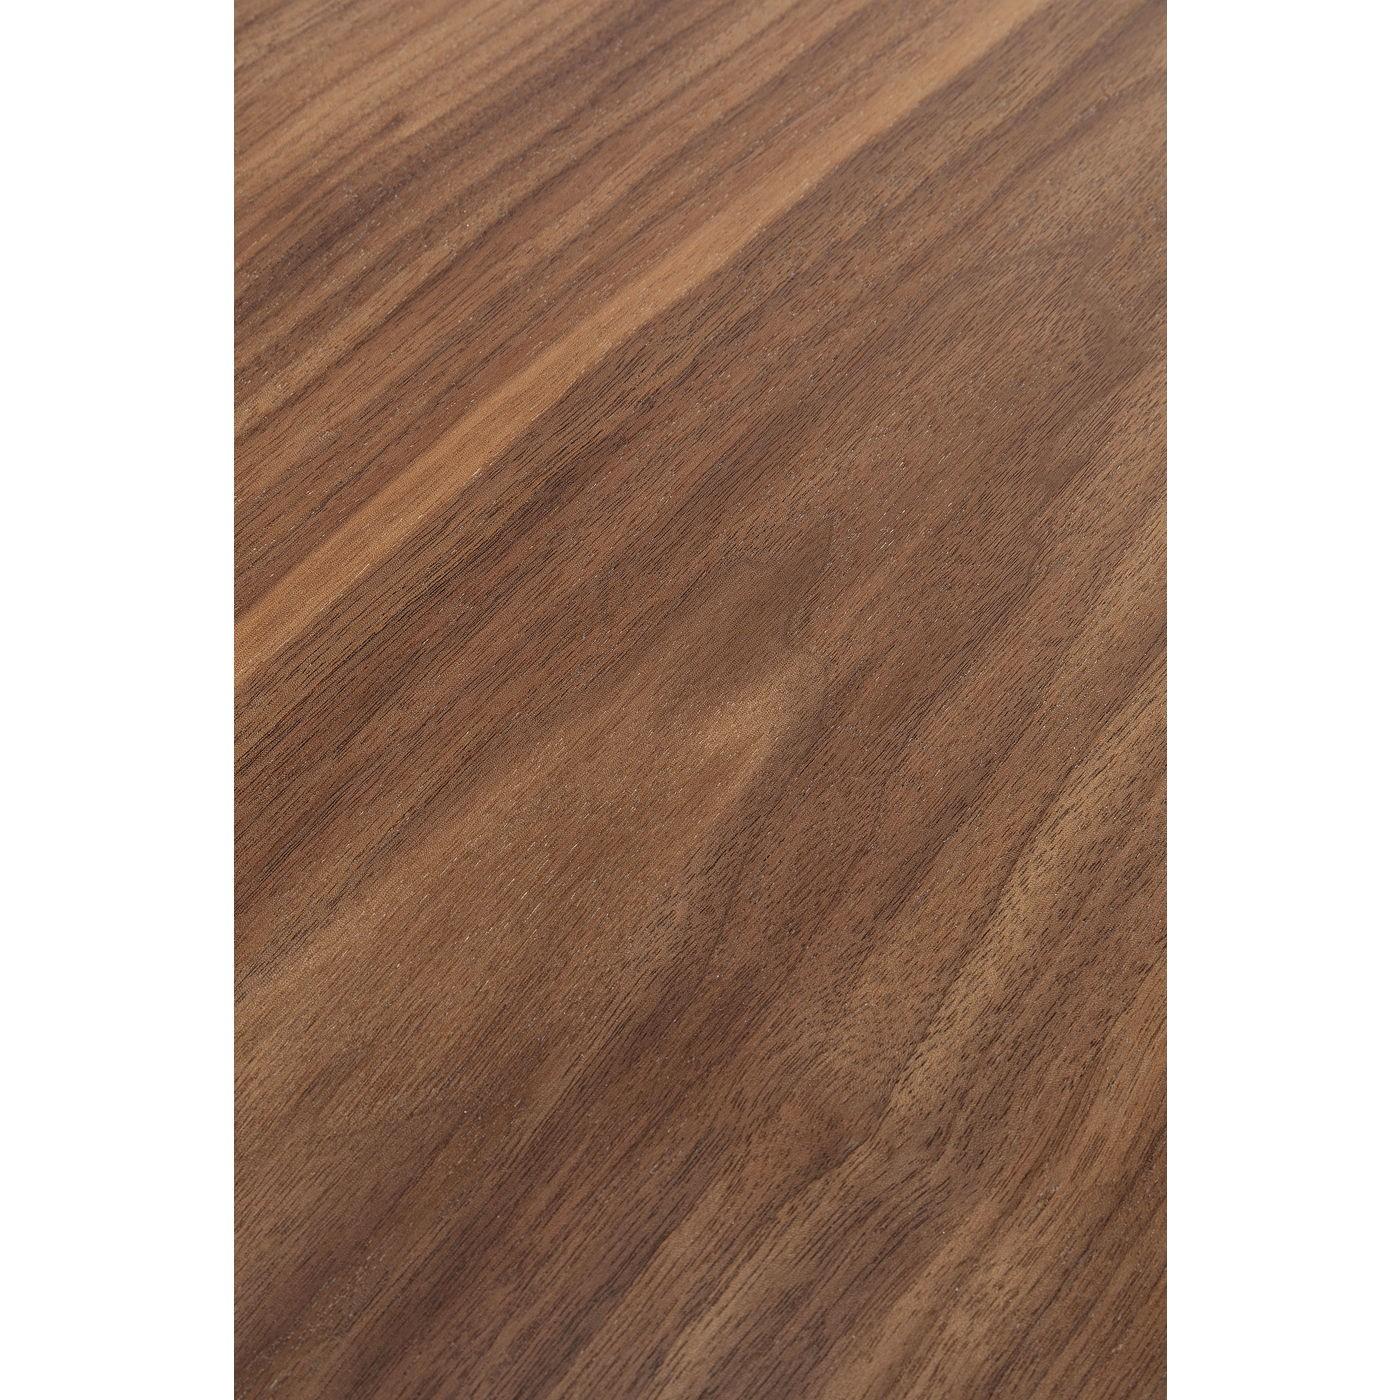 Table Duran Square Kare Design Taille - 160x80cm